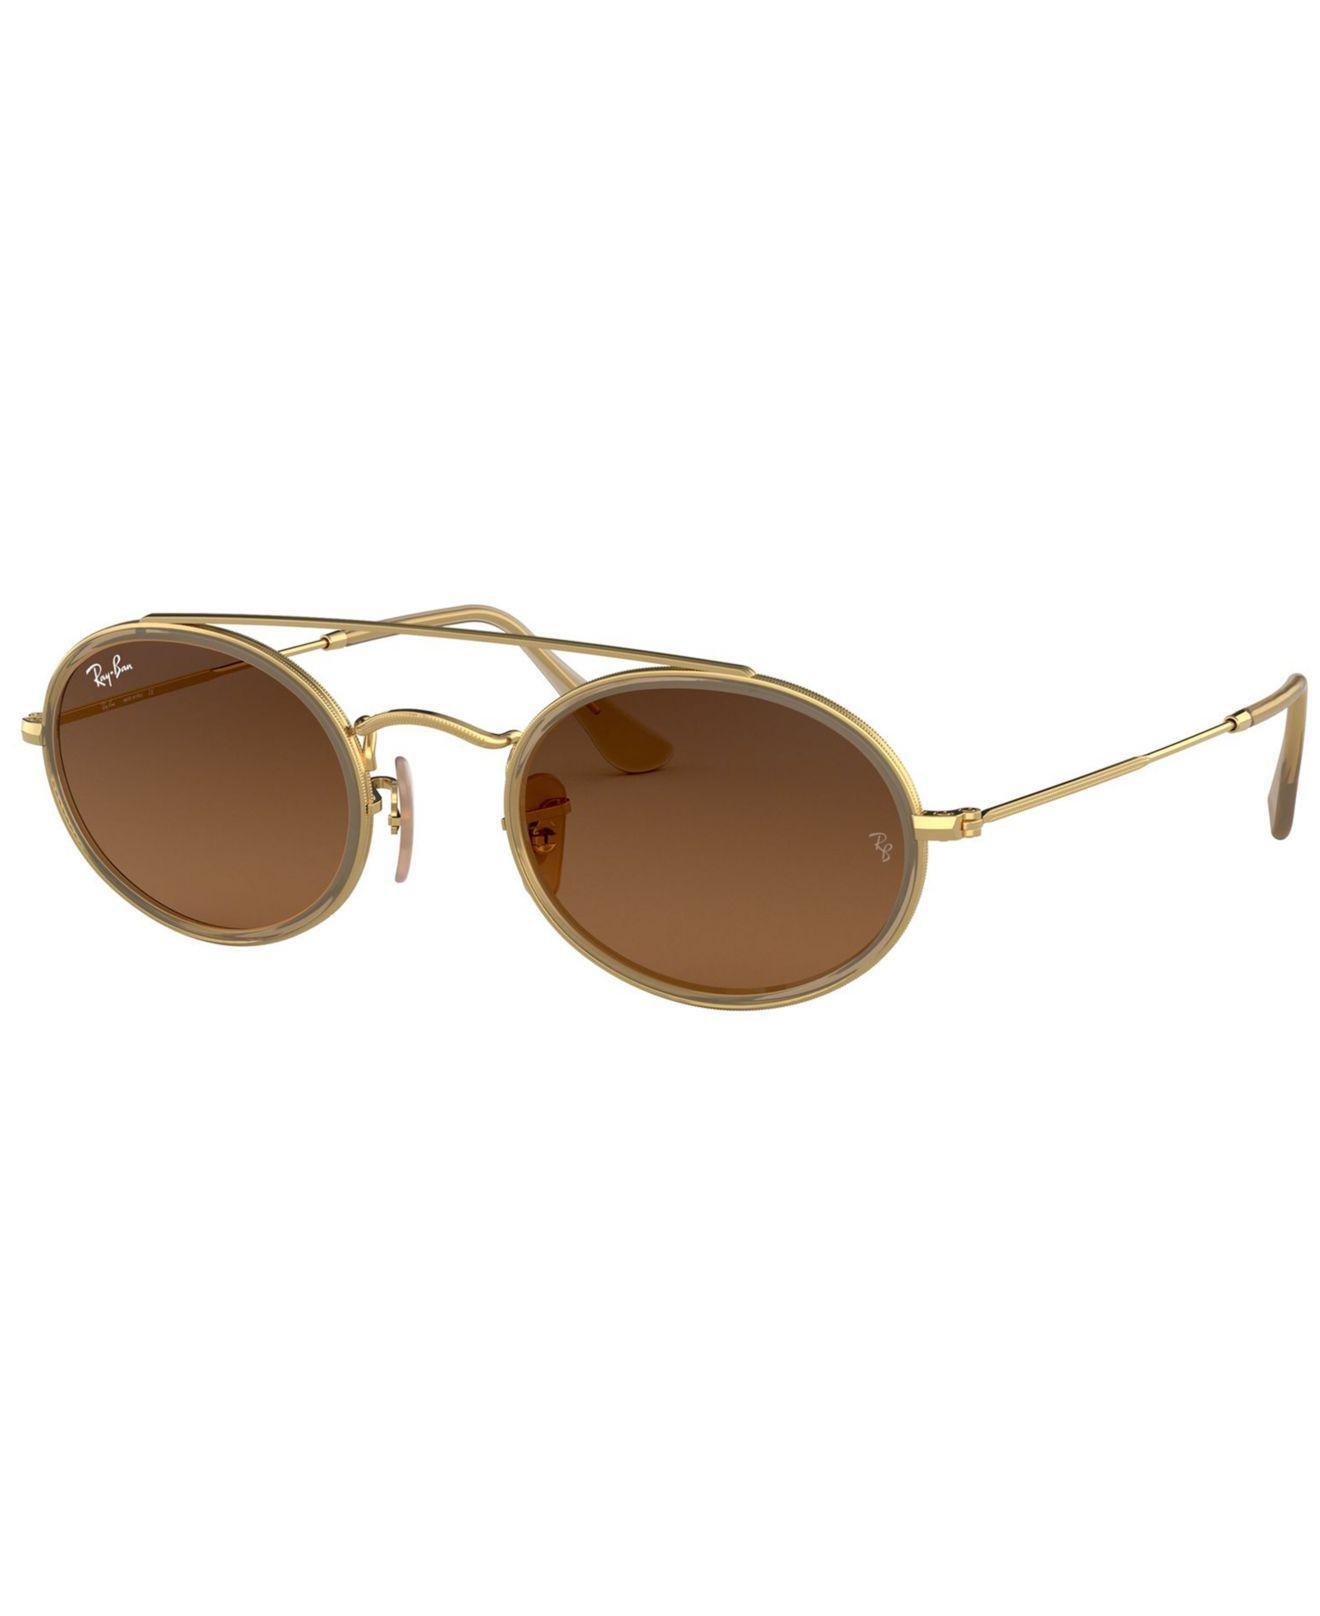 c560434f1ca Ray-Ban. Women s Brown Sunglasses